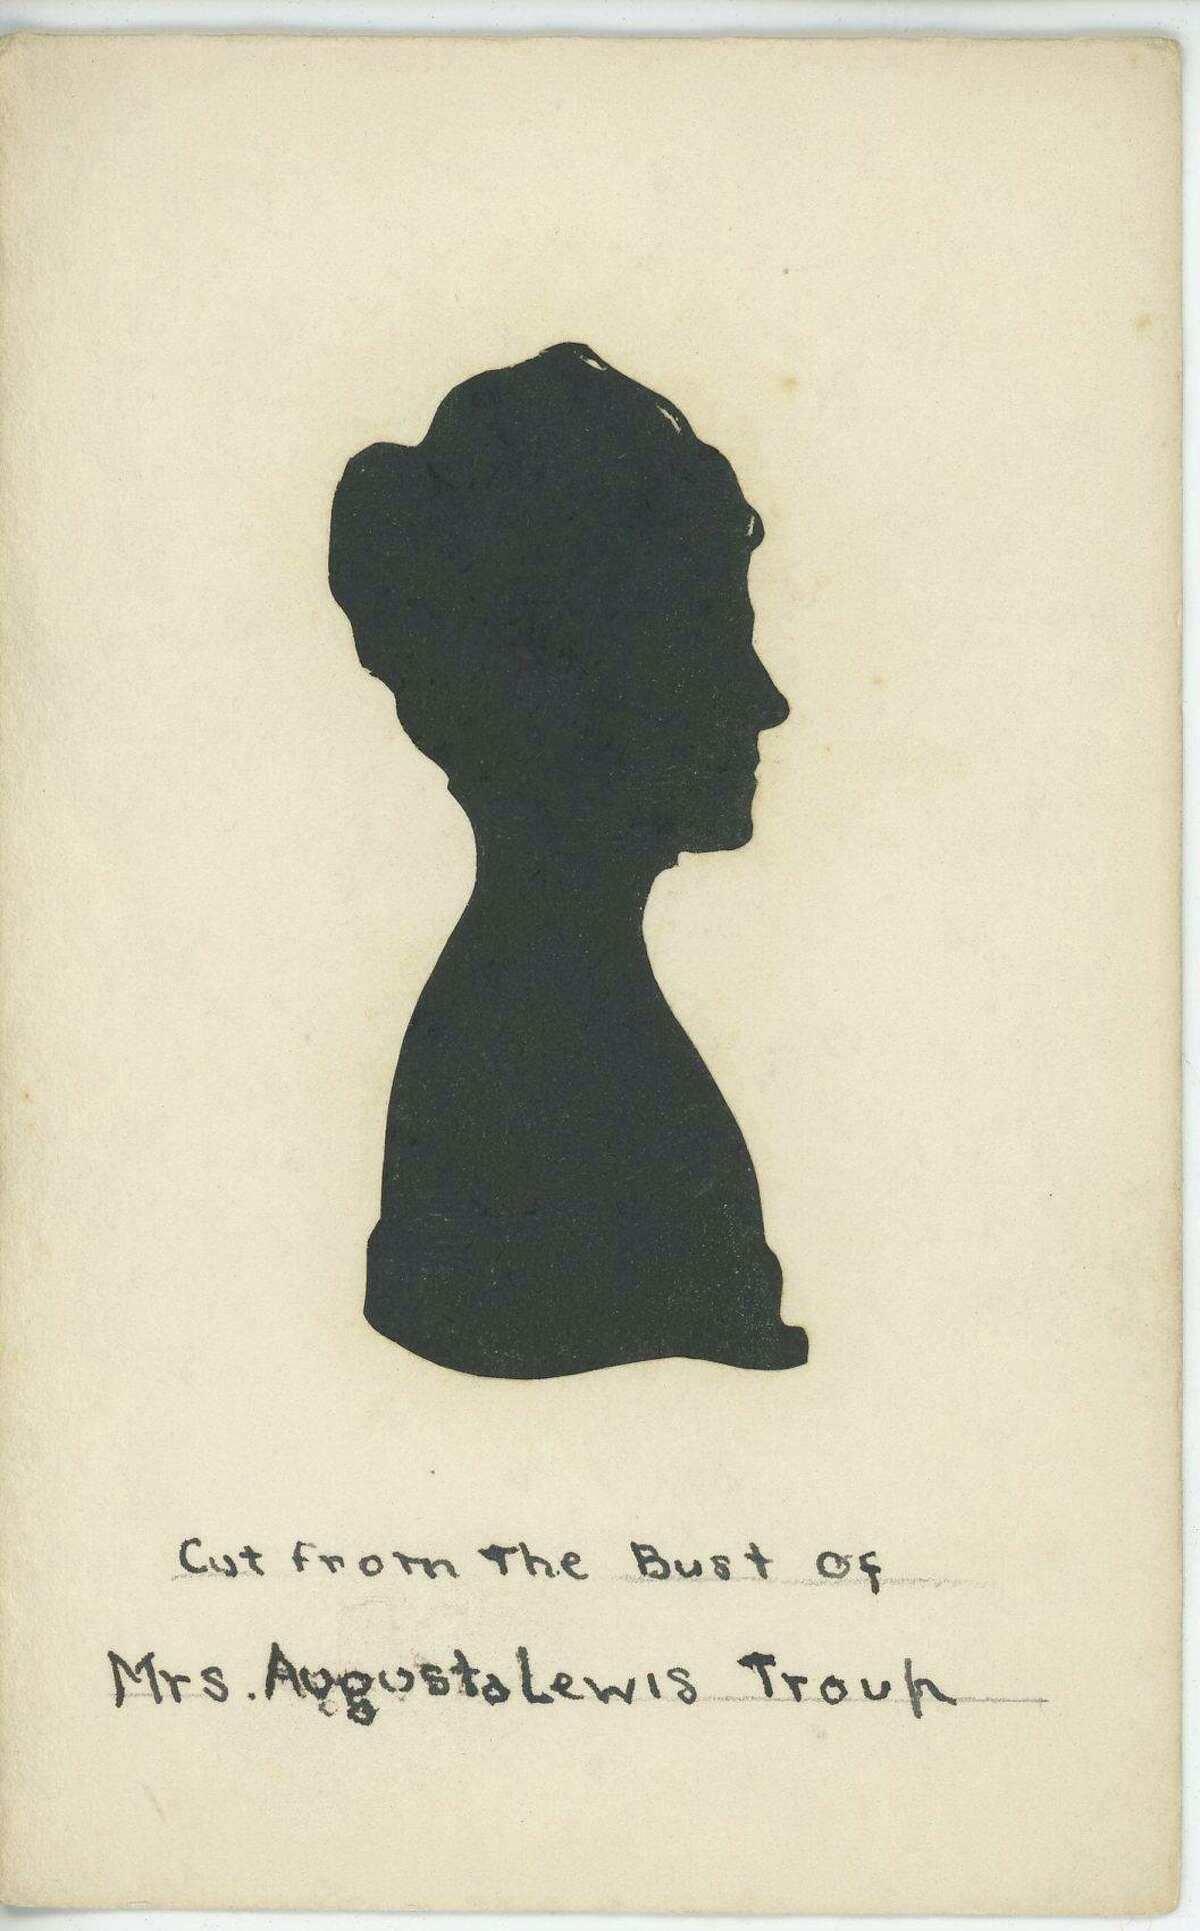 Augusta Troup silhouette